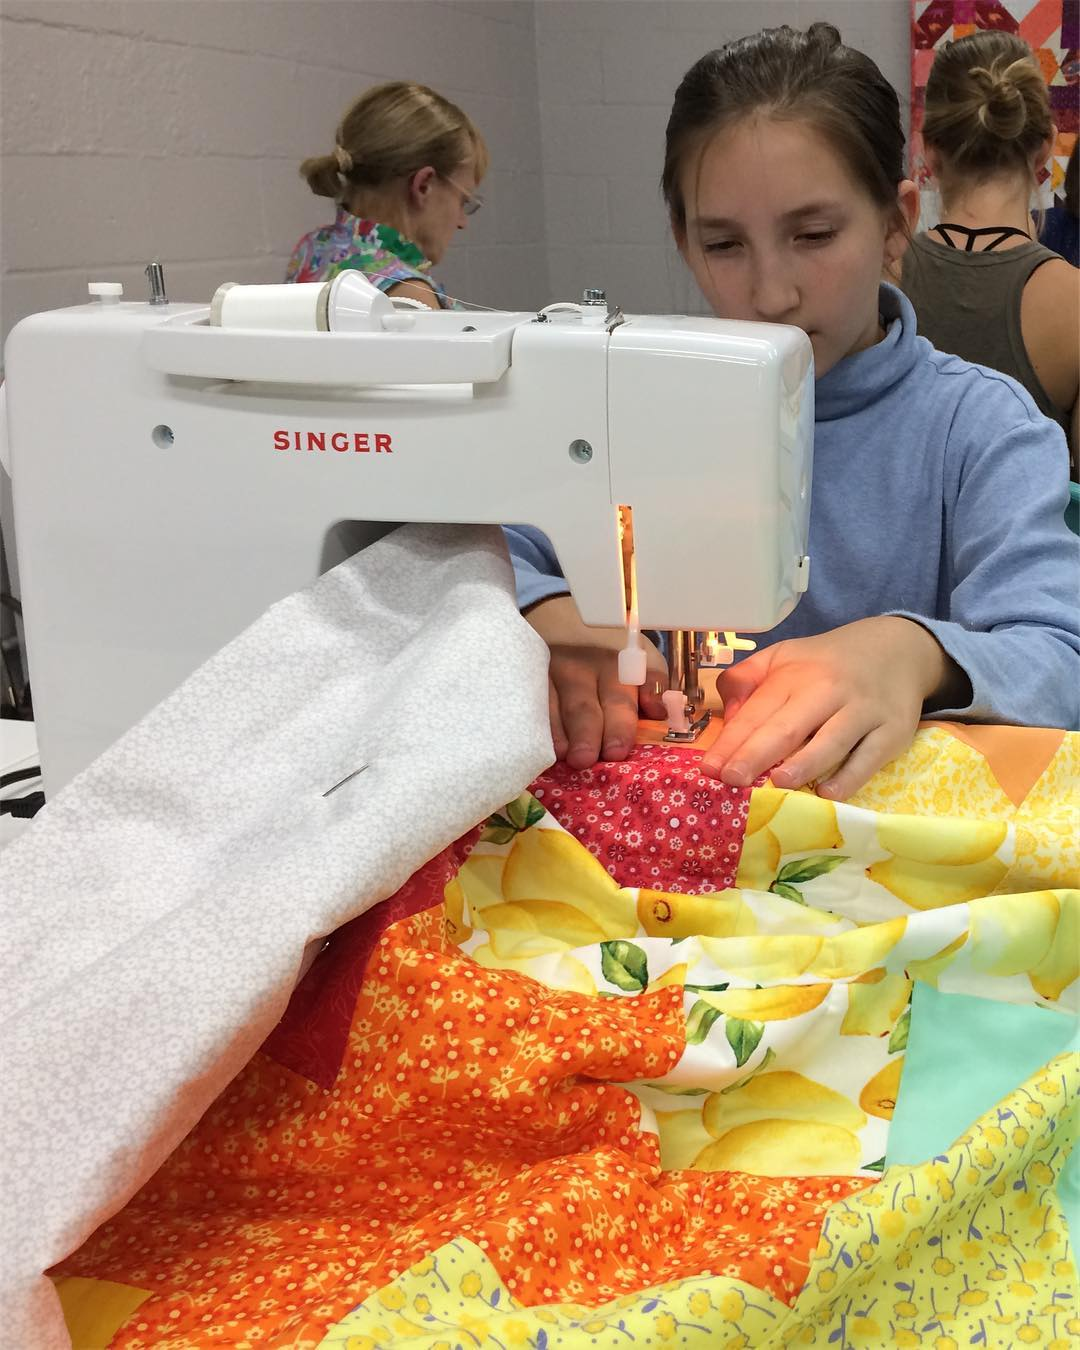 Sewing Classes Atlanta : sewing, classes, atlanta, Beginner, Sewing, Classes, Fabricate, Studios